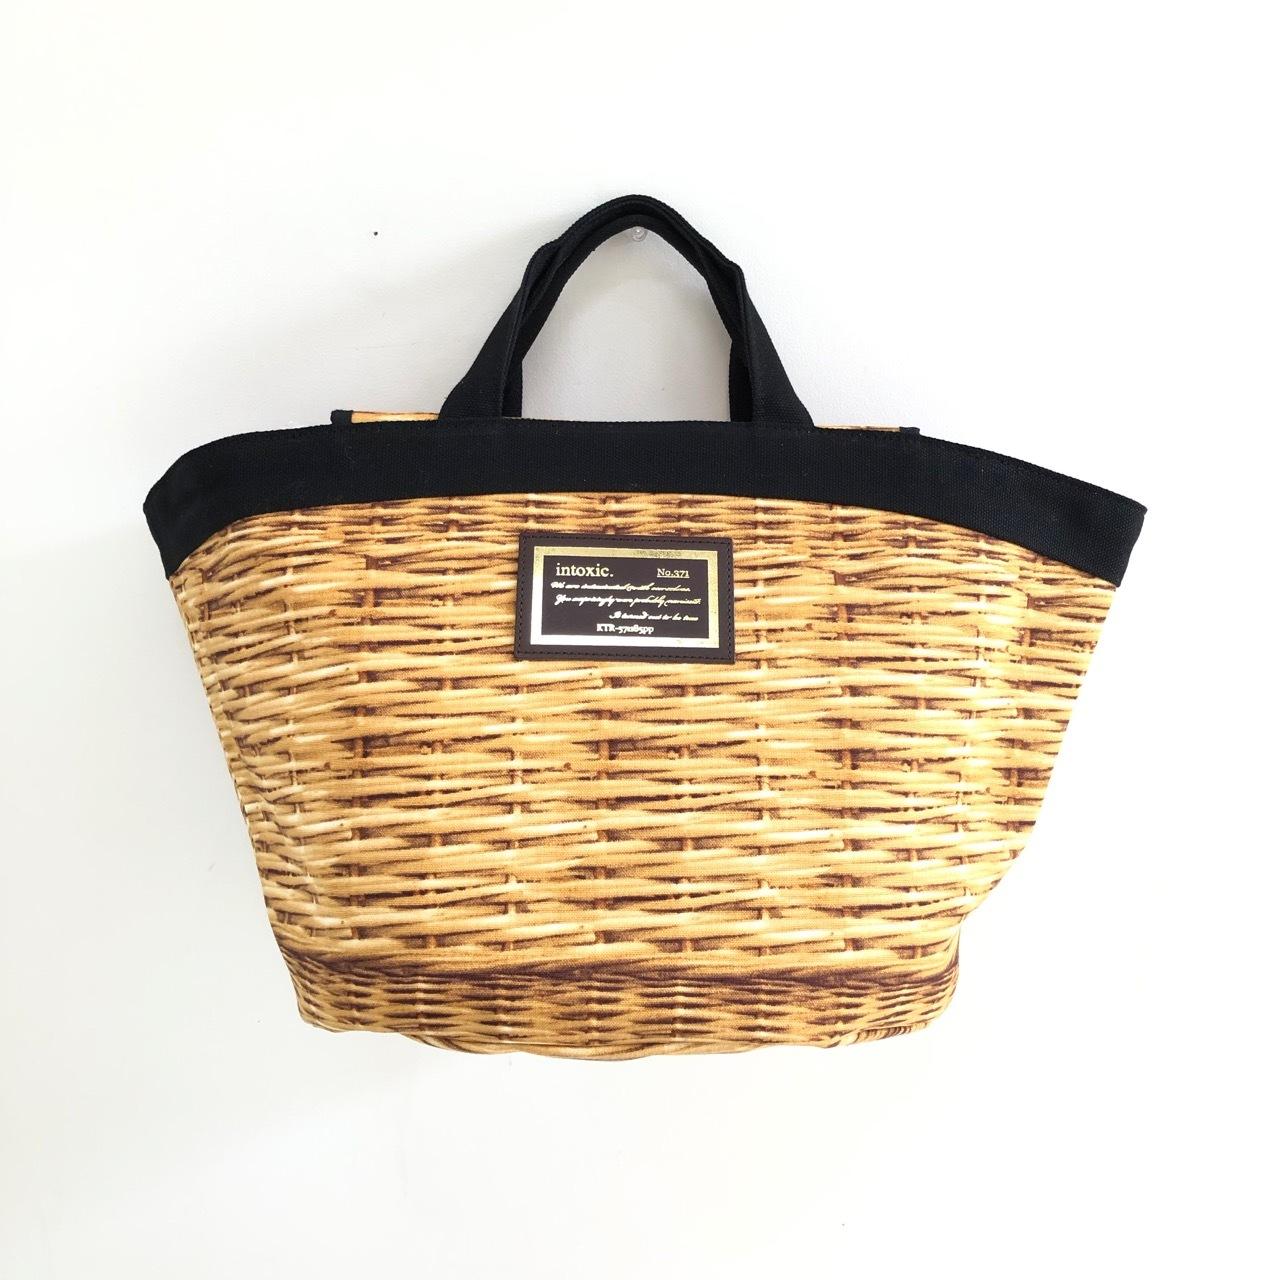 【 INTOXIC 】marche mini fake basket